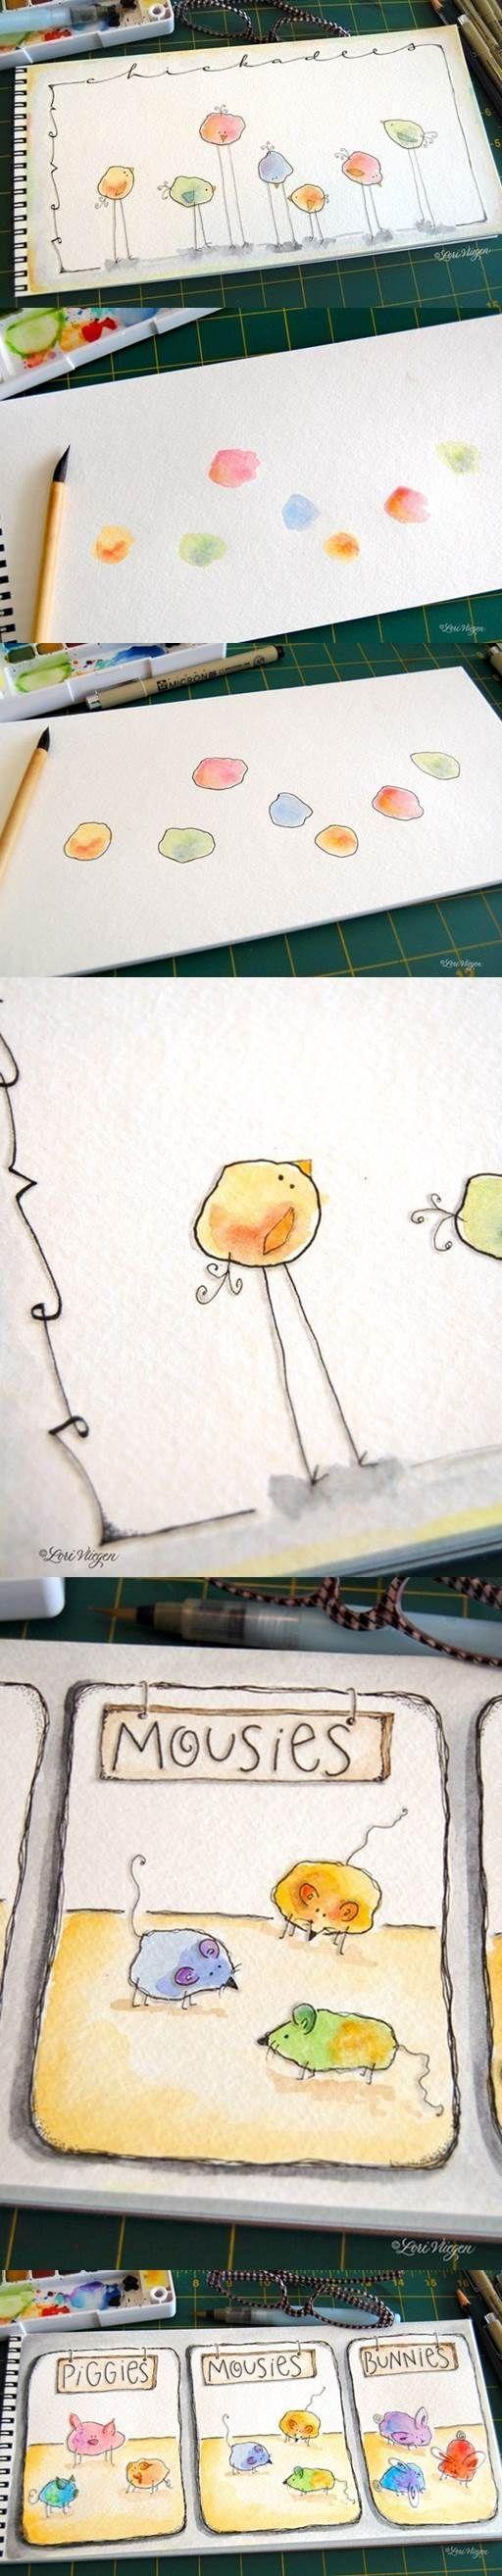 Creative Ways to Draw Funny Birds | iCreativeIdeas.com LIKE Us on Facebook ==> https://www.facebook.com/icreativeideas